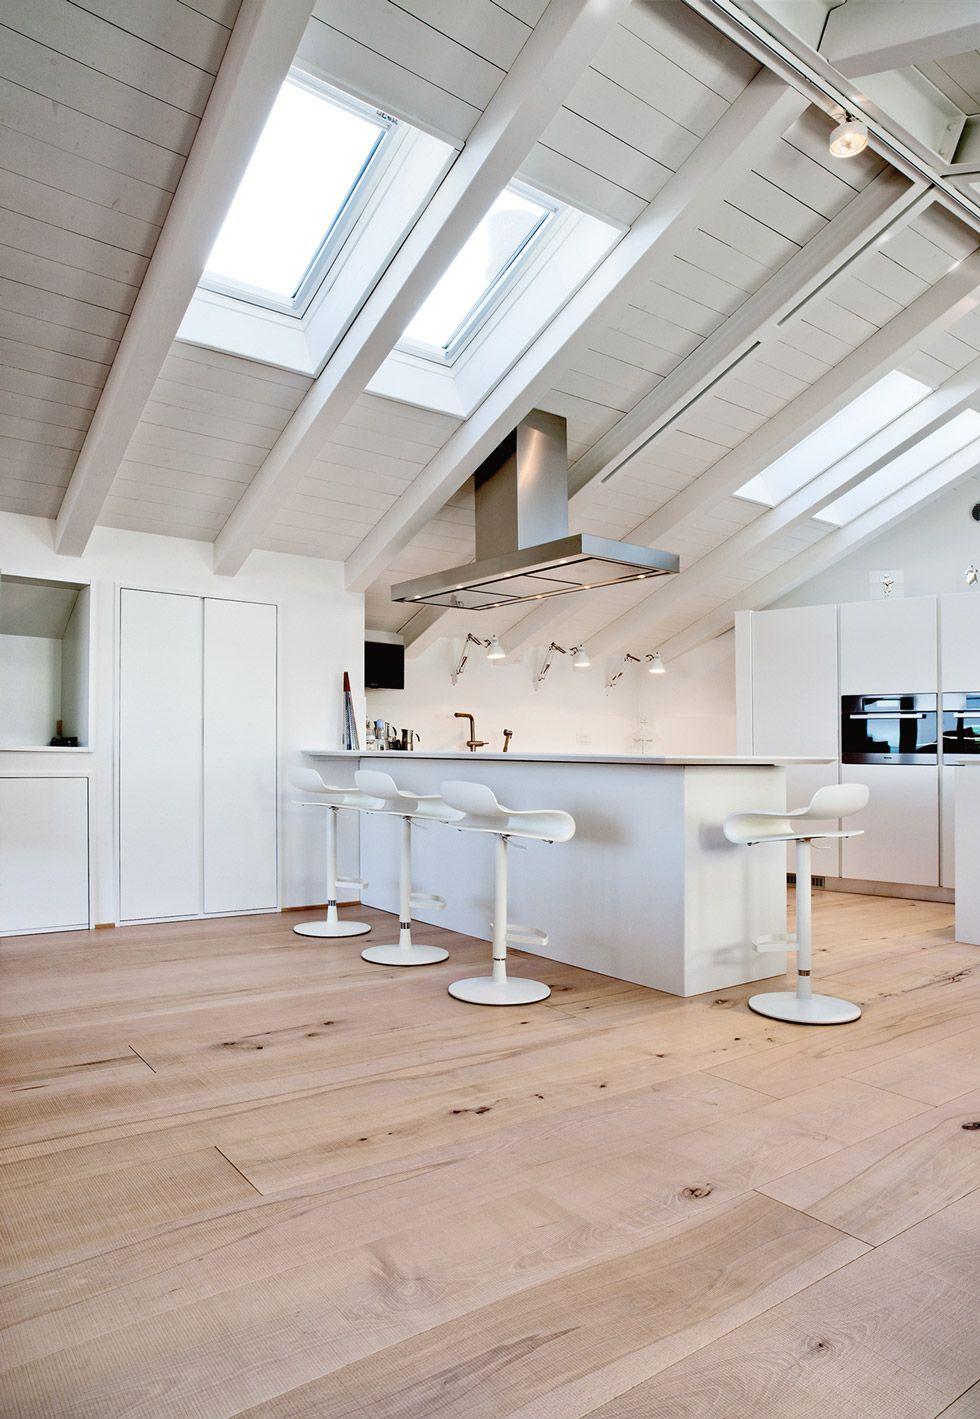 Idee per mansarde moderne cucina open space bianco e for Mansarda in legno bianco